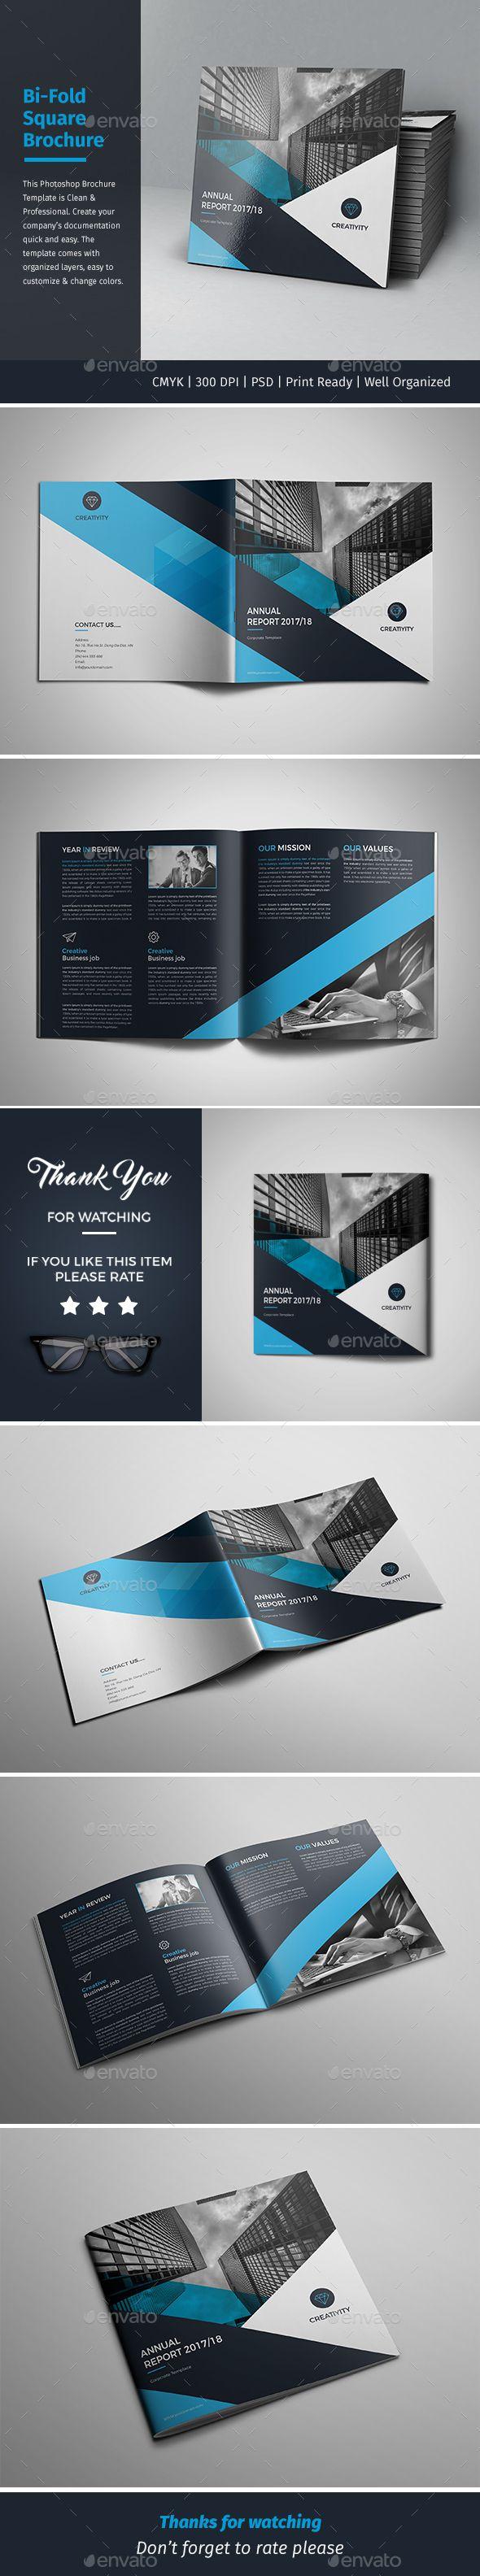 Corporate Bi-fold Square Brochure Template PSD                                                                                                                                                                                 More